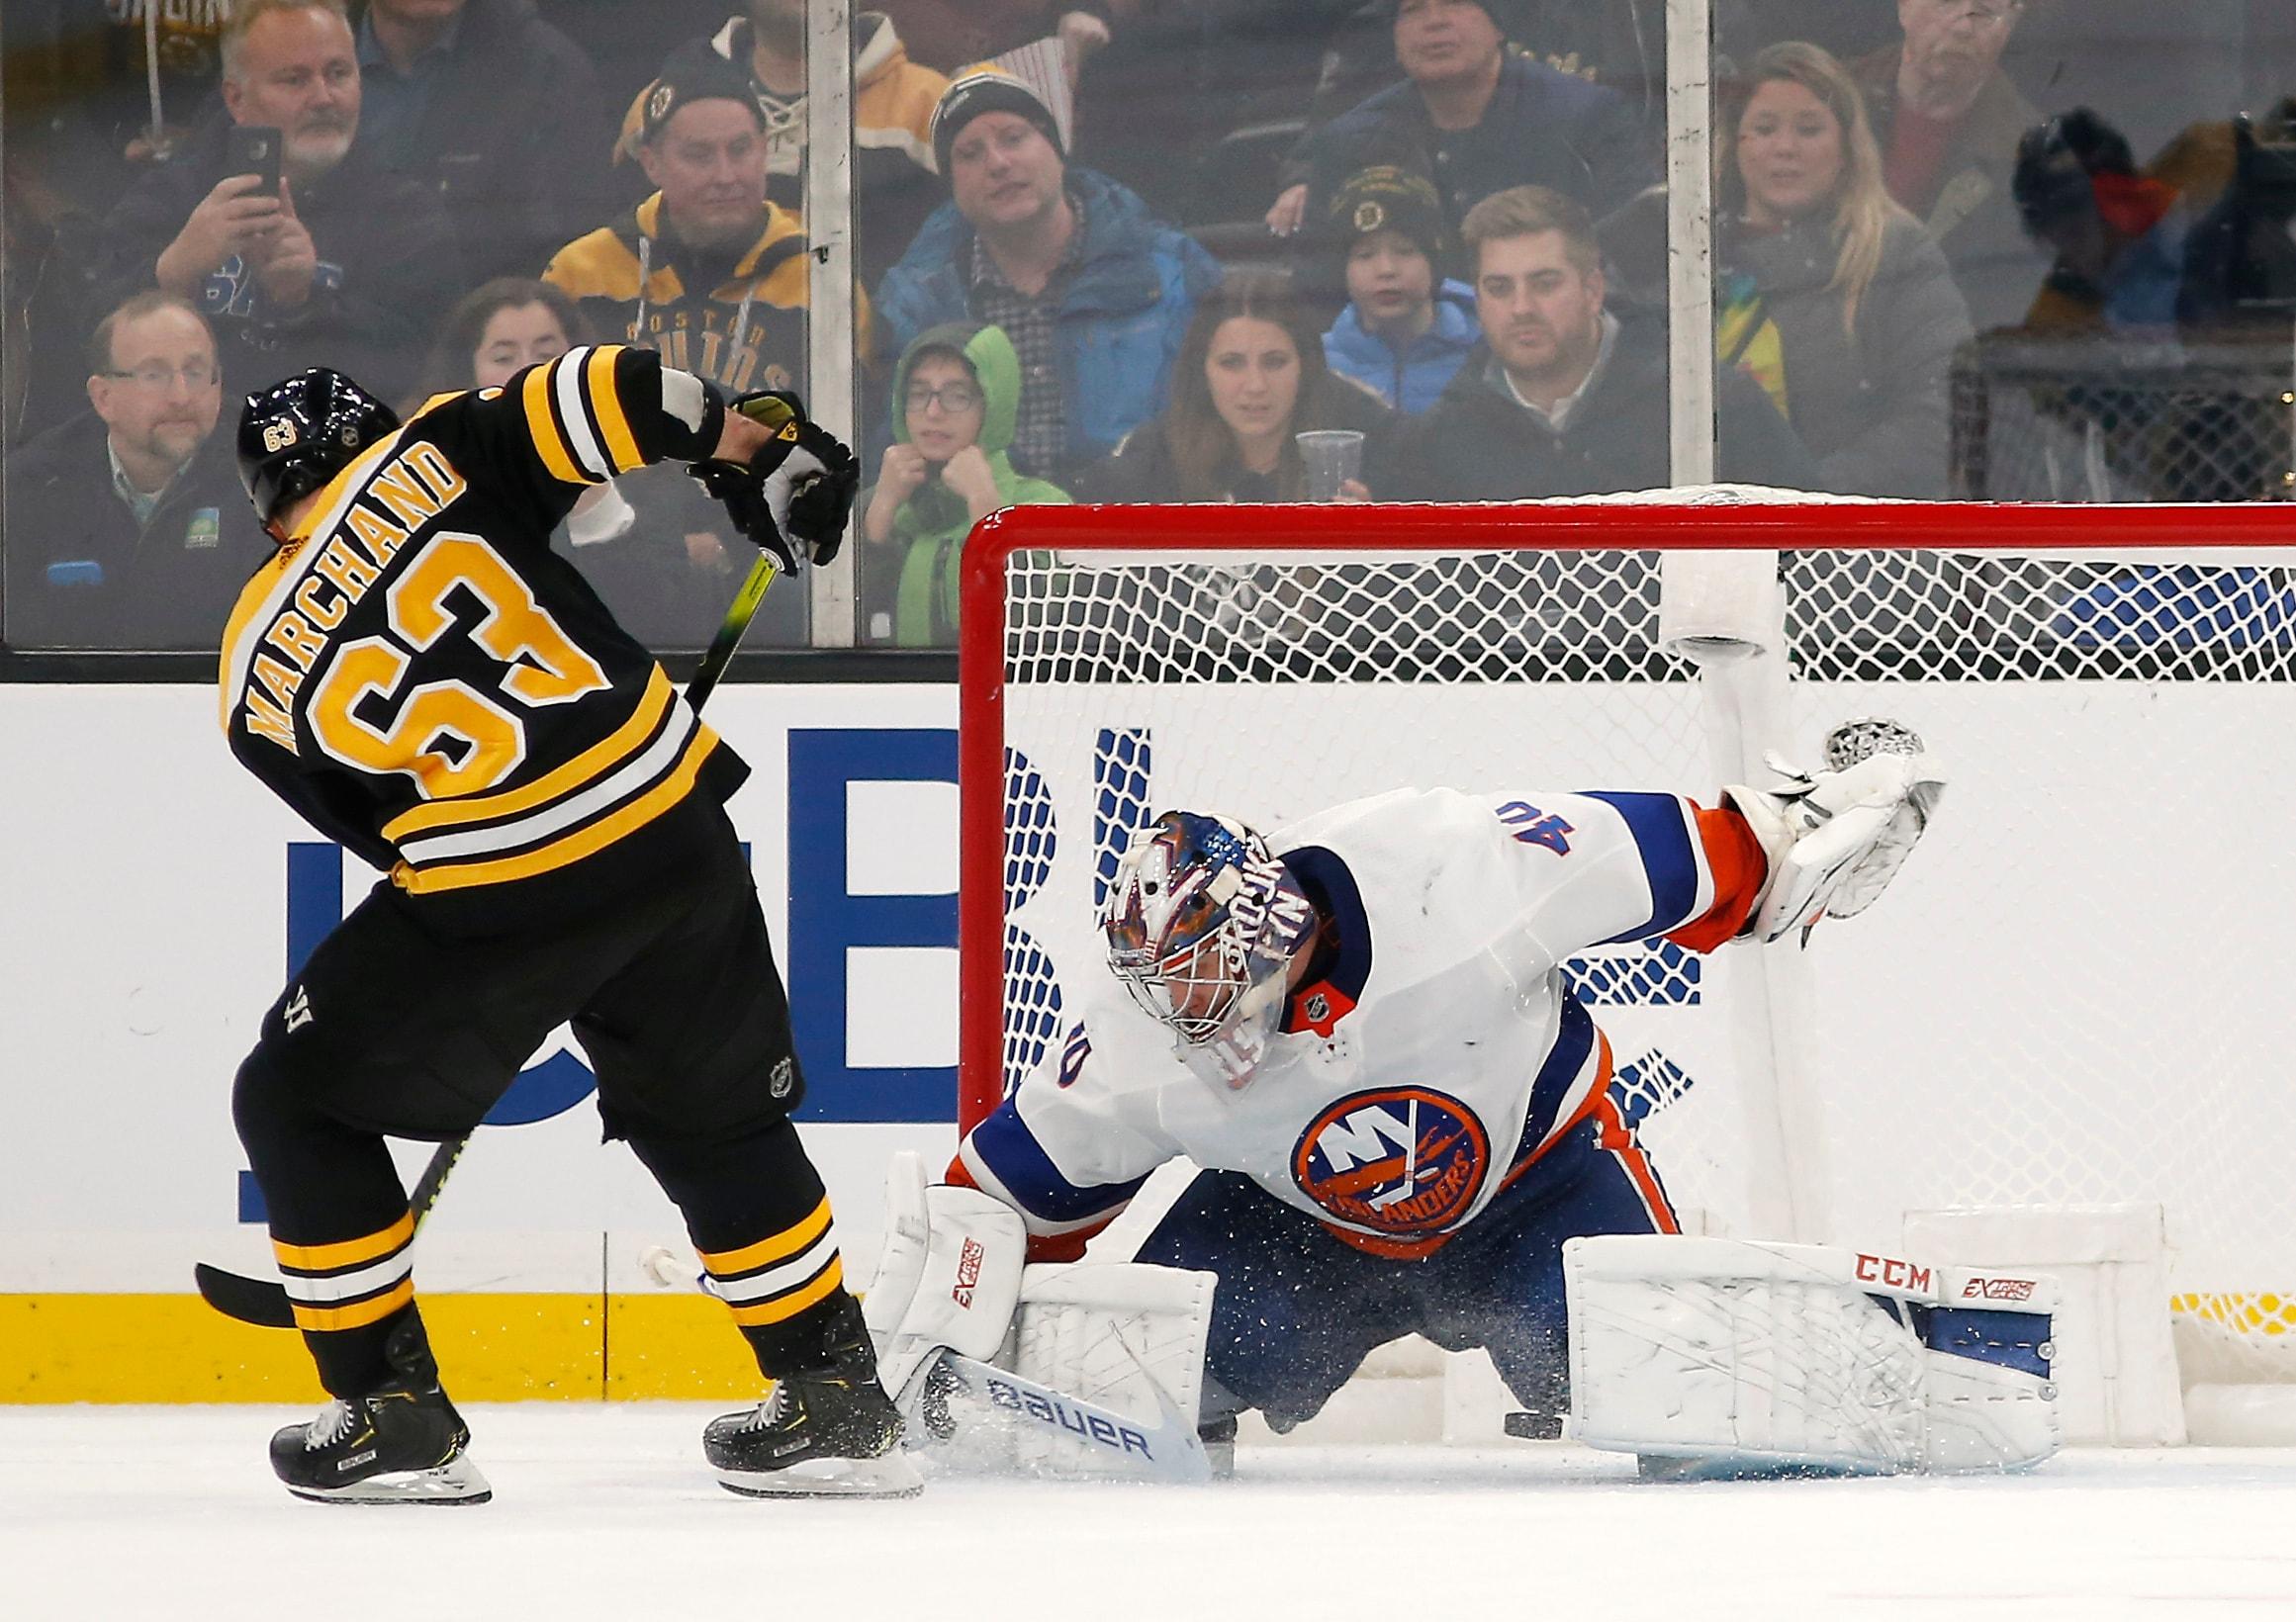 New York Islanders Top Boston Bruins in a Shootout